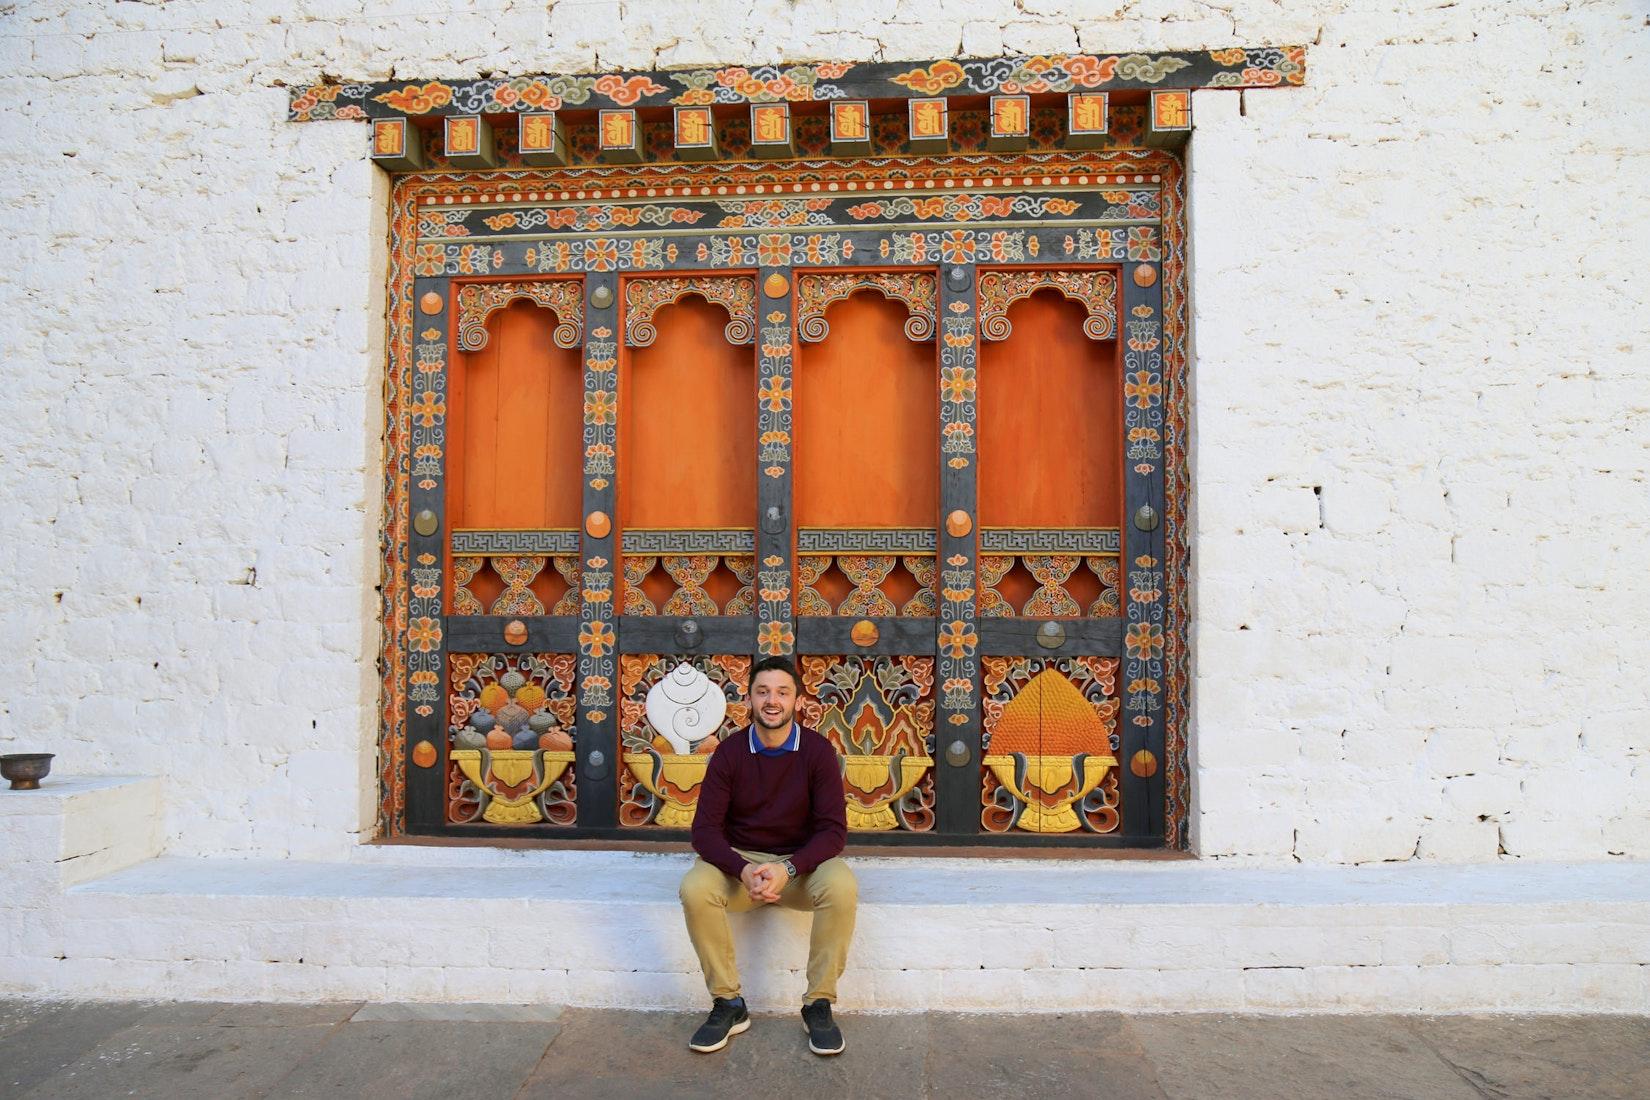 Daniel on his trip to Bhutan